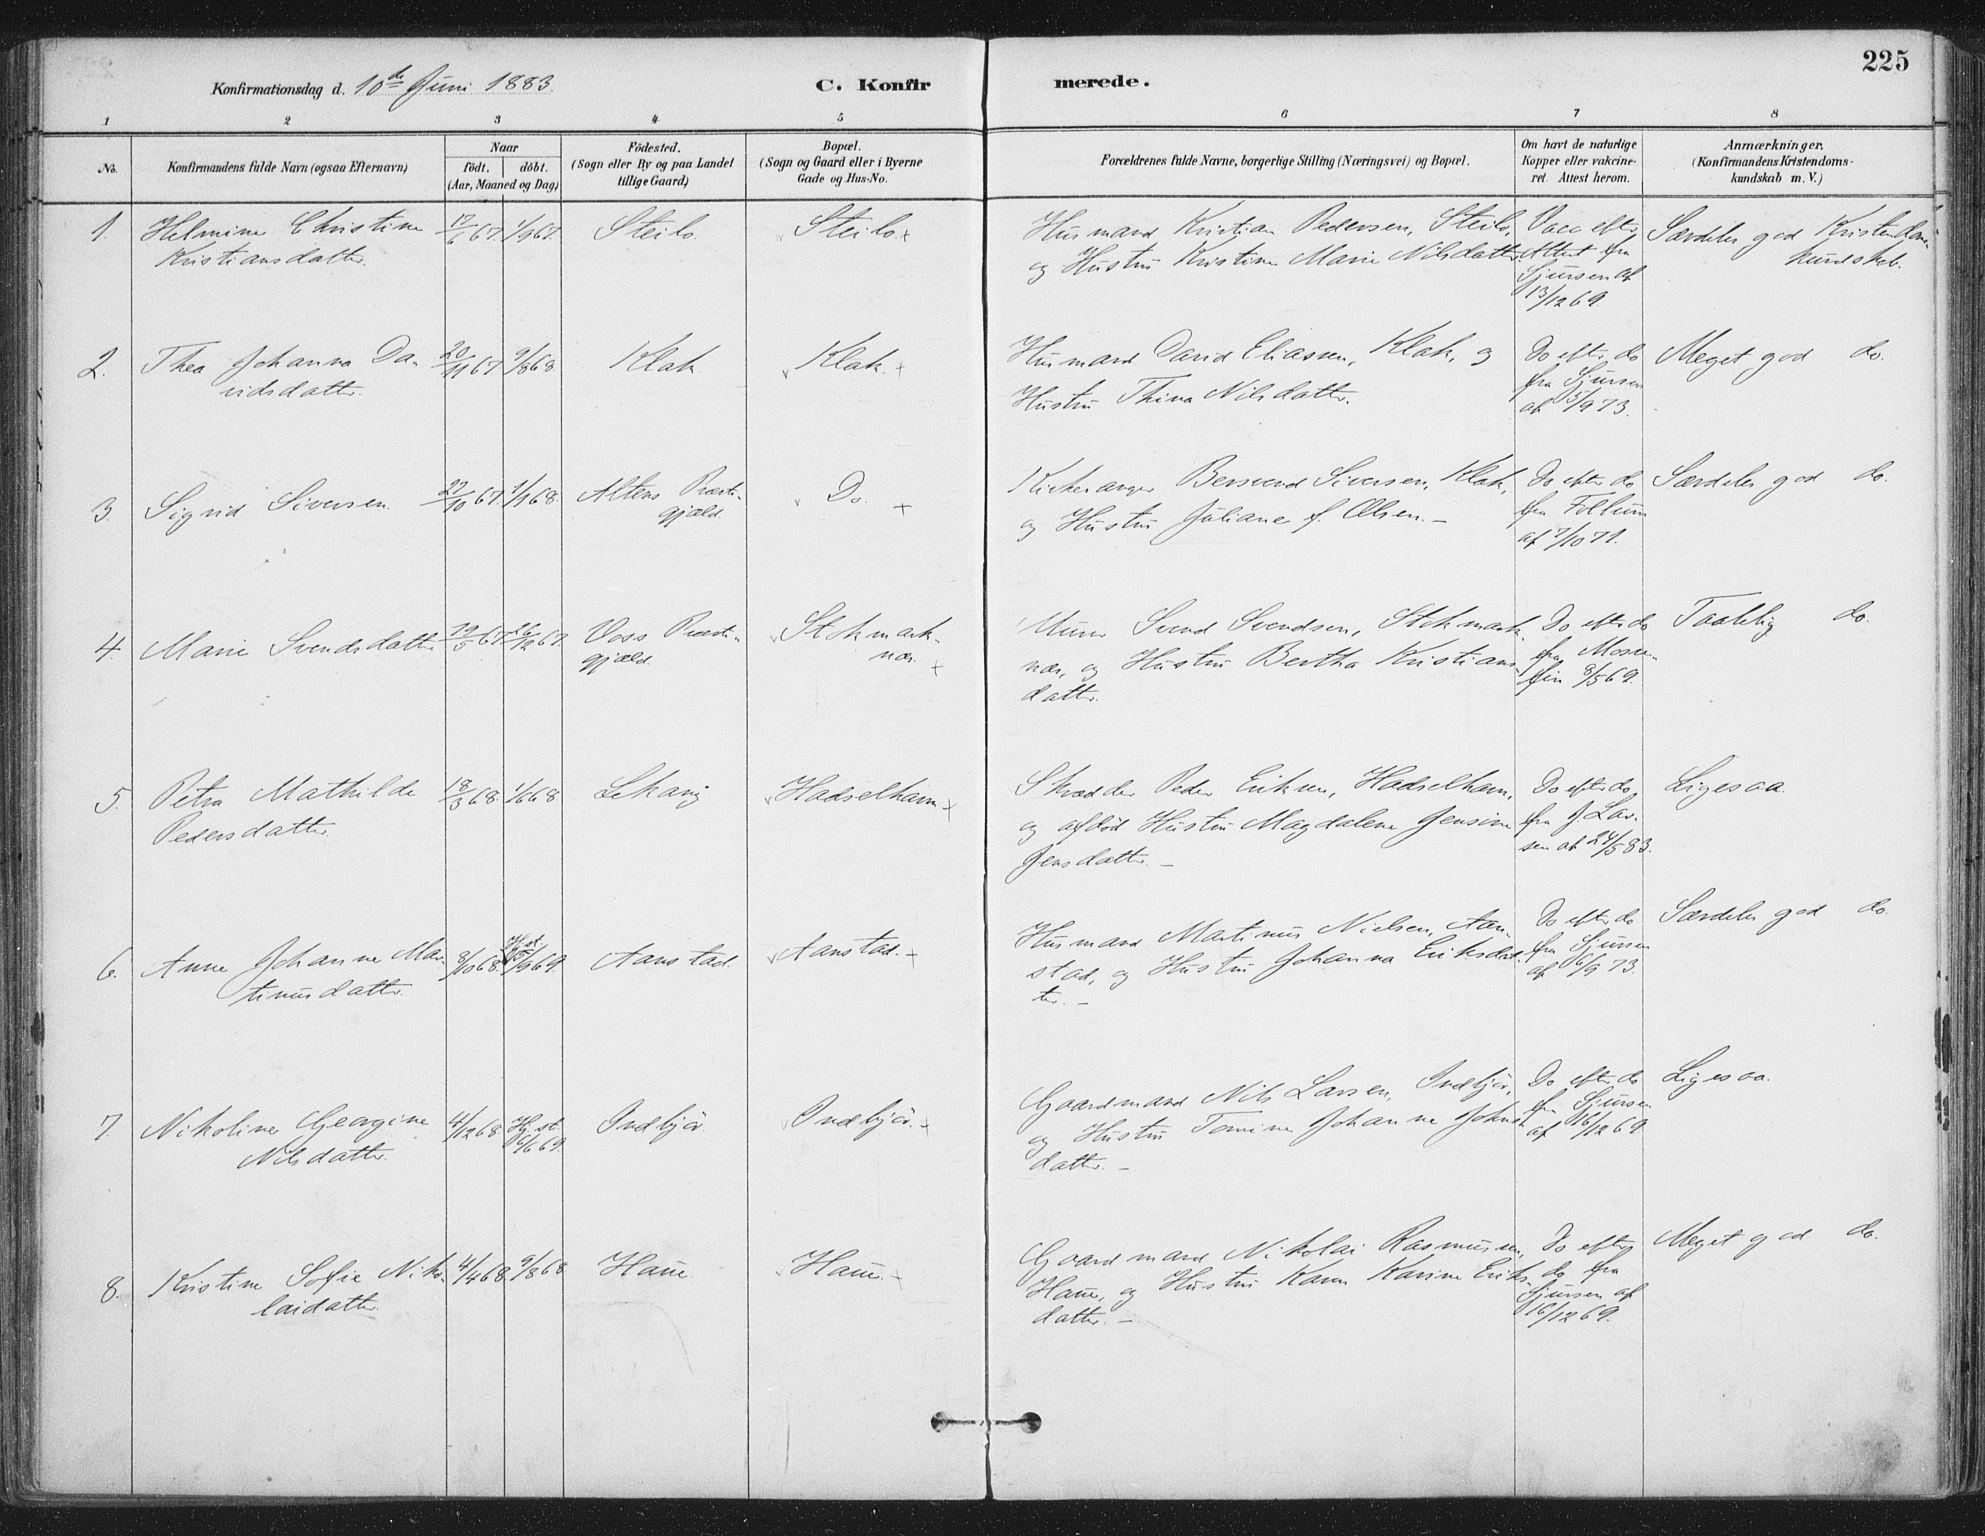 SAT, Ministerialprotokoller, klokkerbøker og fødselsregistre - Nordland, 888/L1244: Ministerialbok nr. 888A10, 1880-1890, s. 225